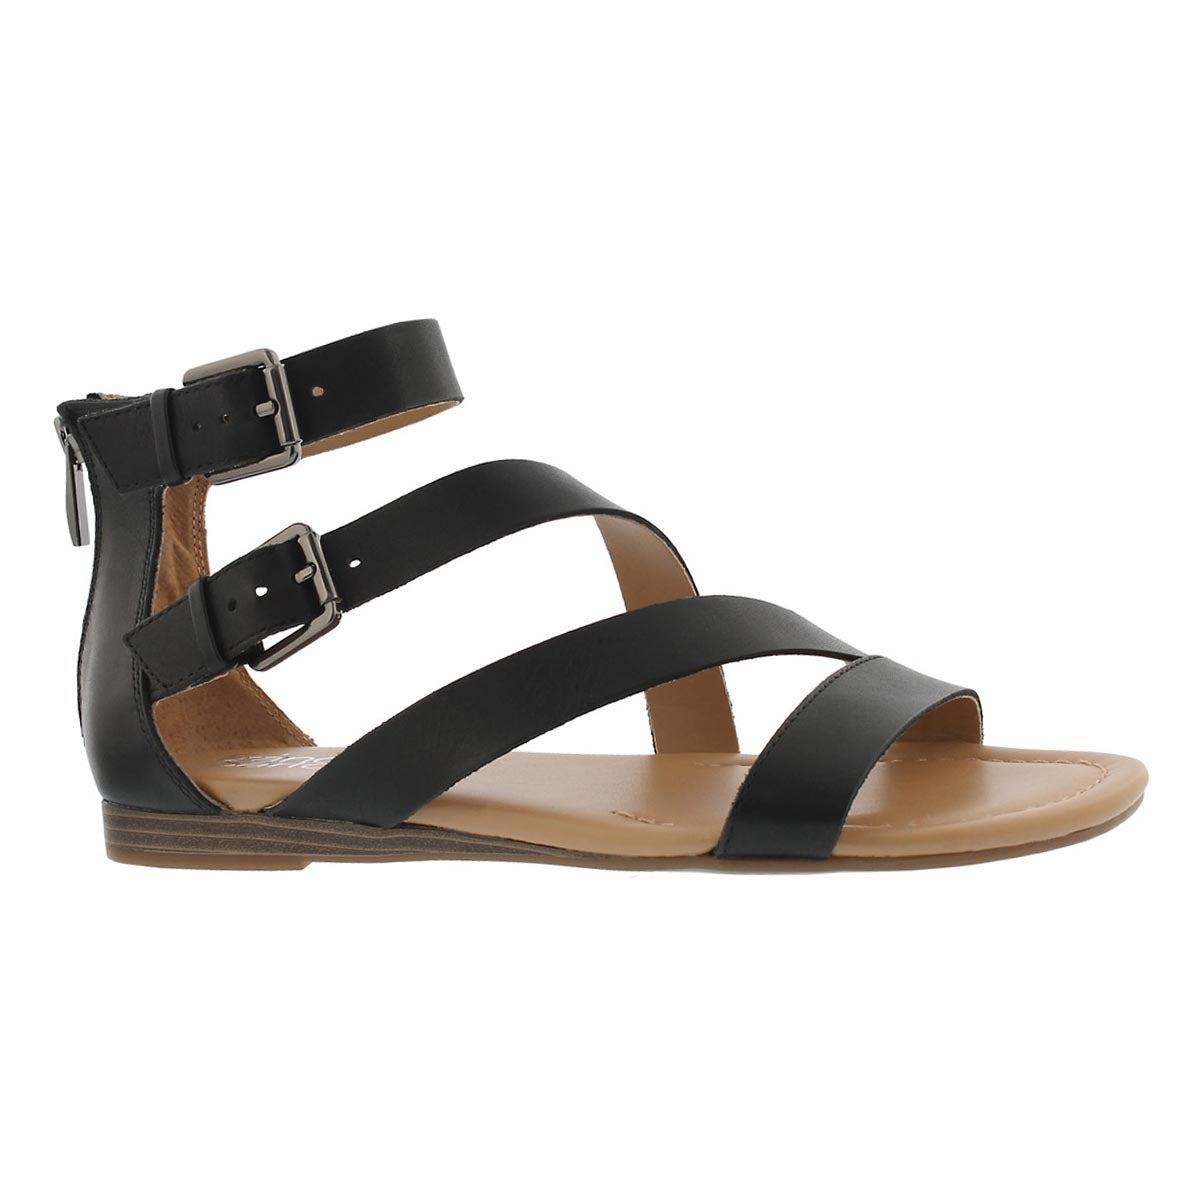 Women's GRETA black casual wedge sandals